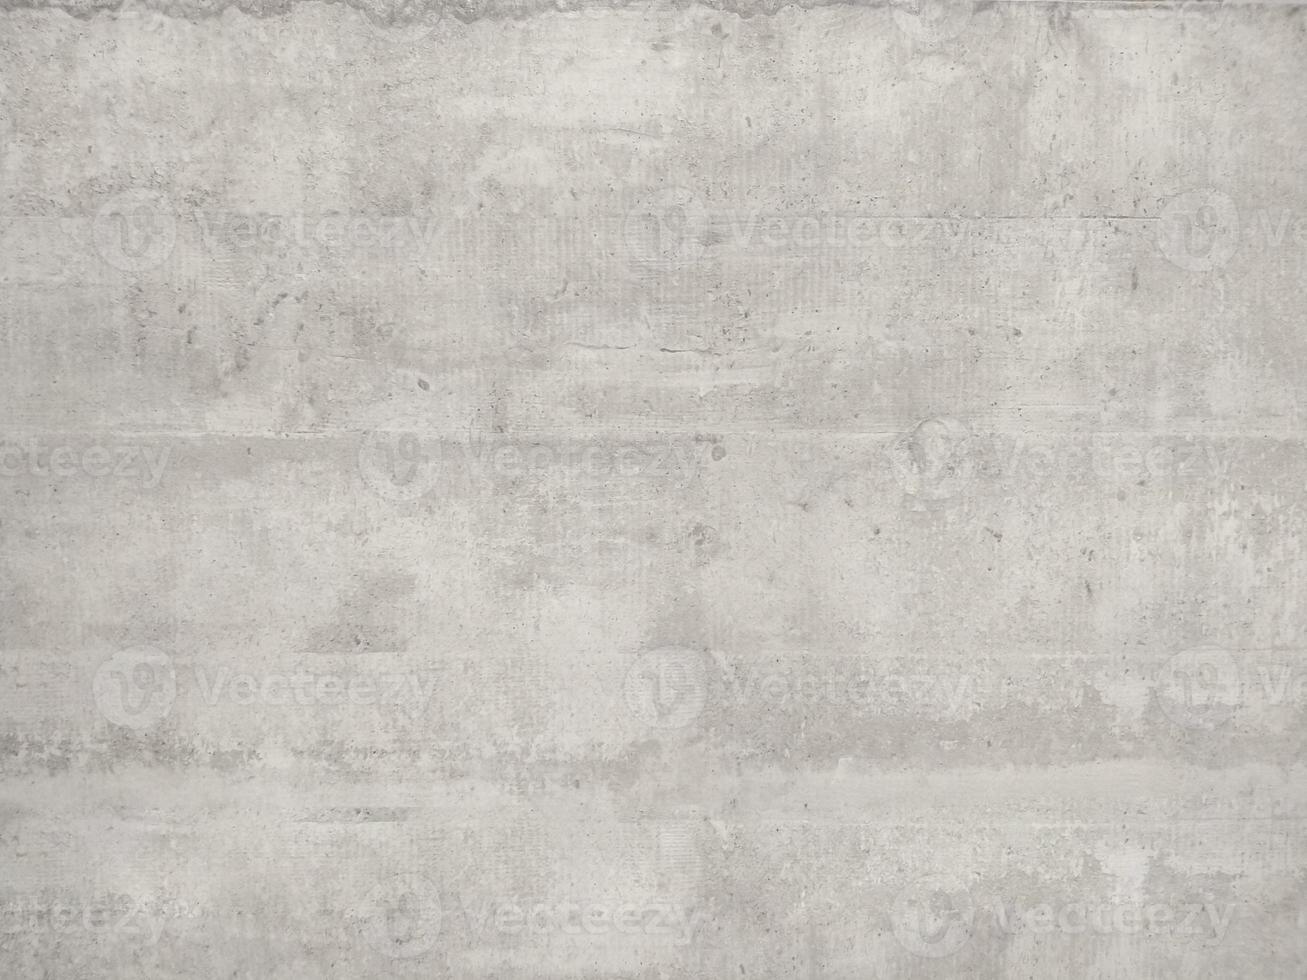 sfondo grigio rustico foto